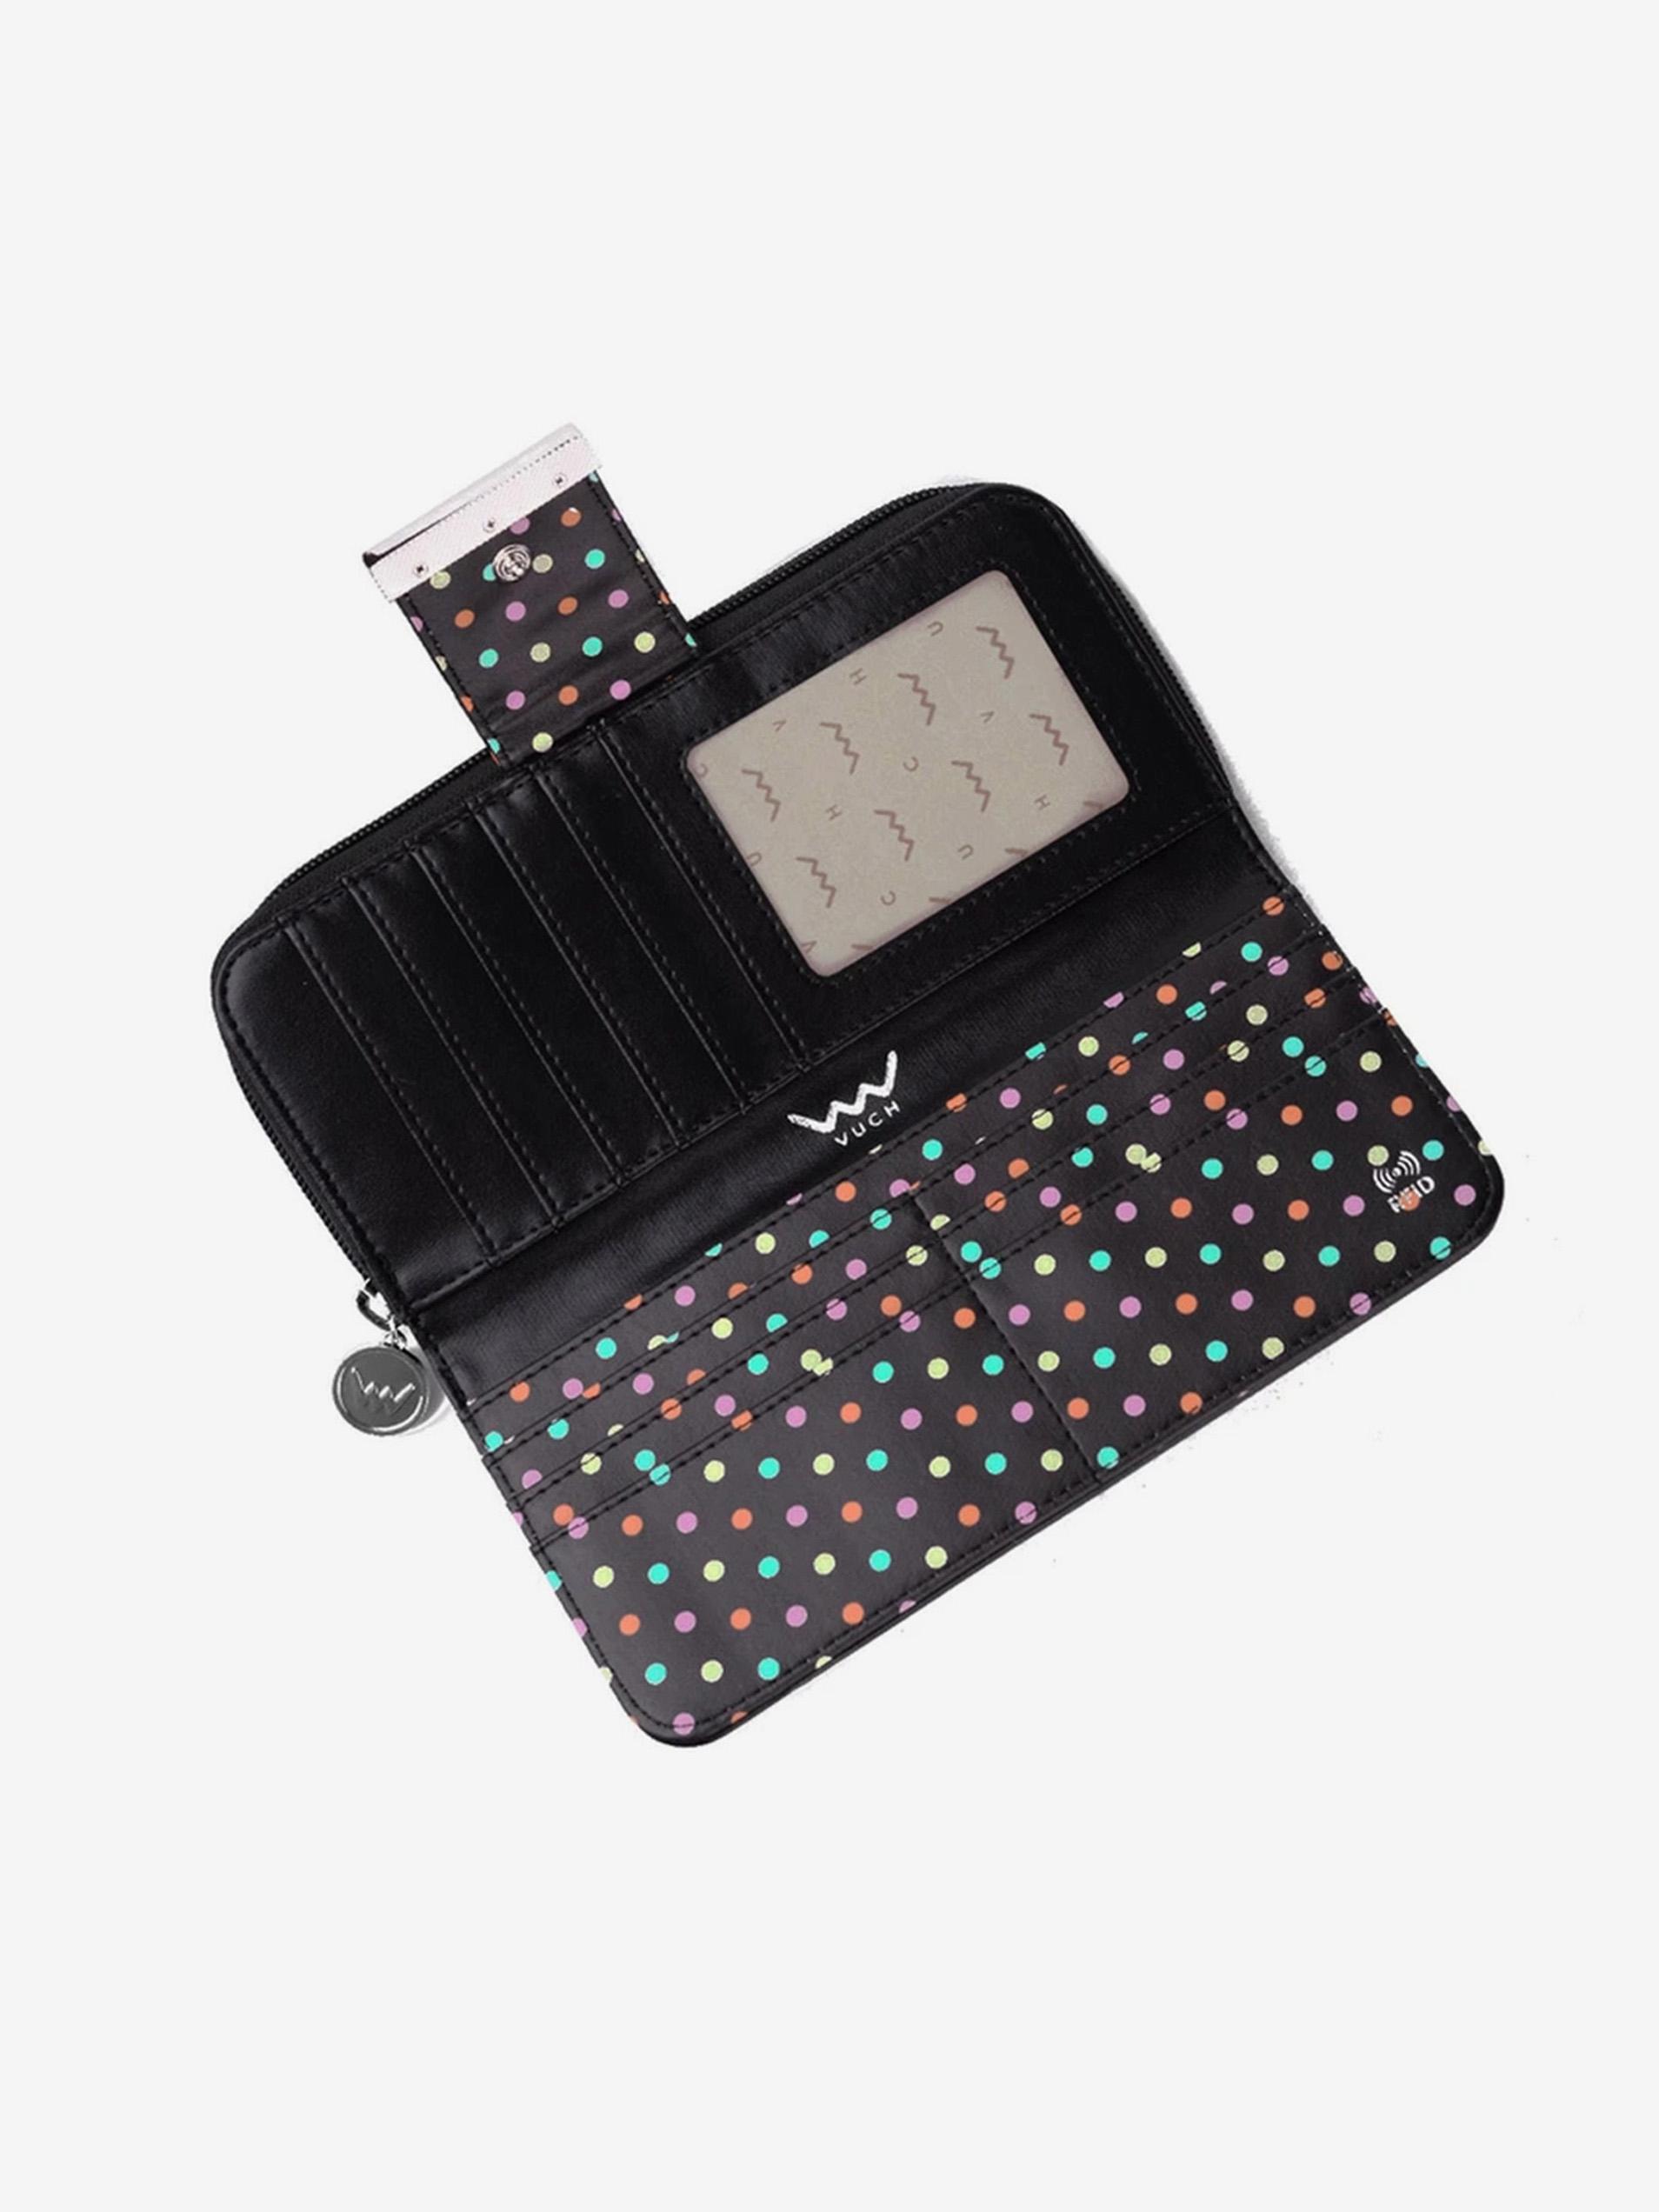 Vuch negre portofel Florianna